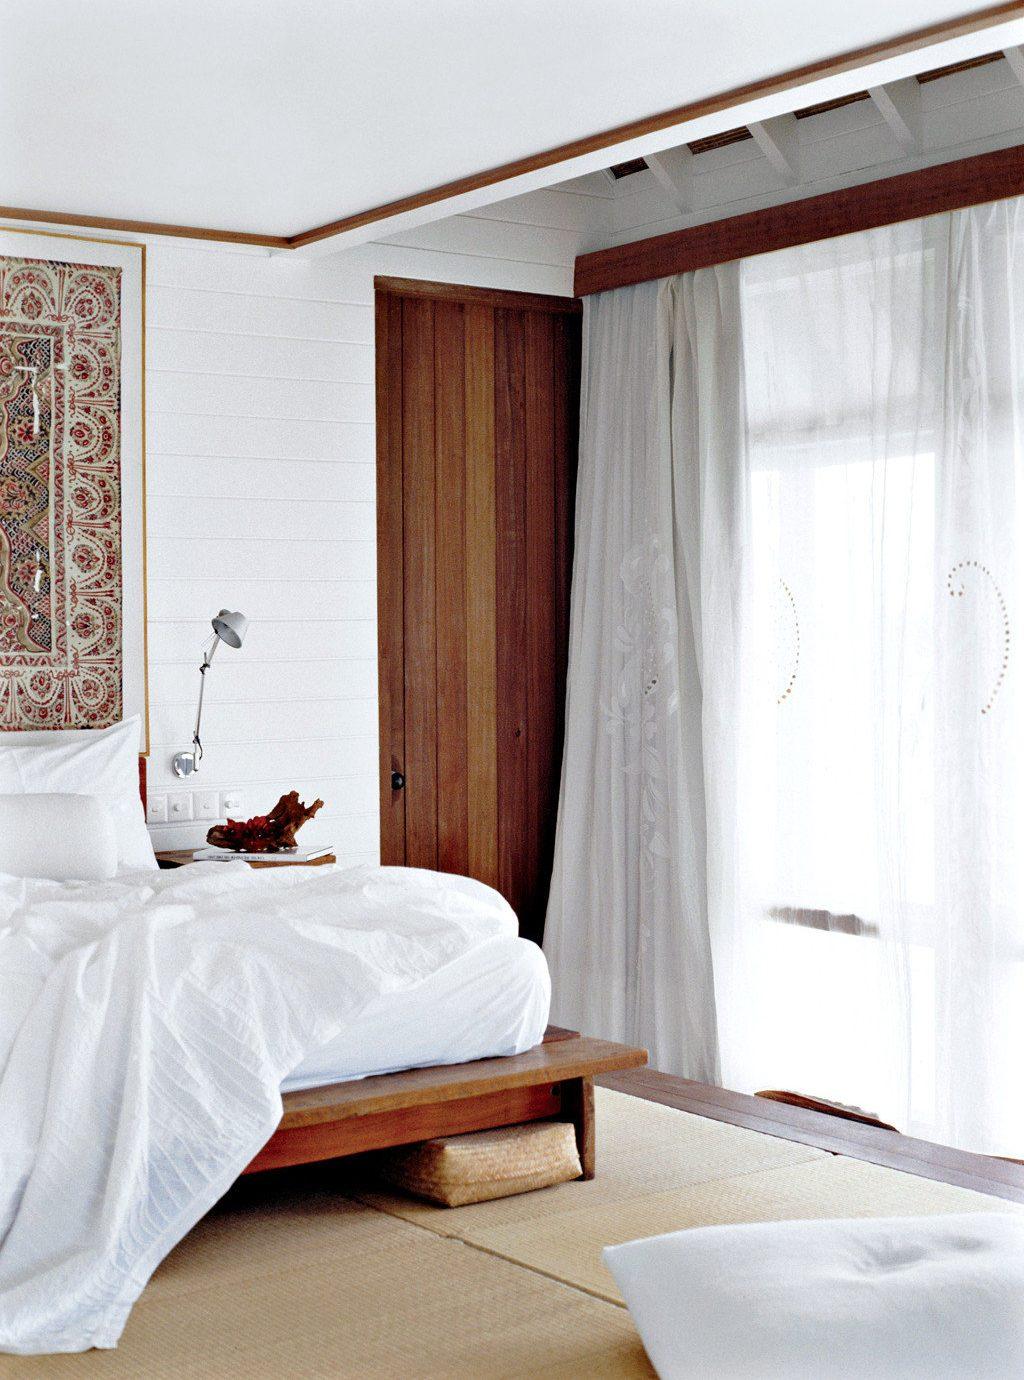 Bedroom Honeymoon Luxury Overwater Bungalow Romance Romantic Tropical Waterfront curtain Suite textile window treatment